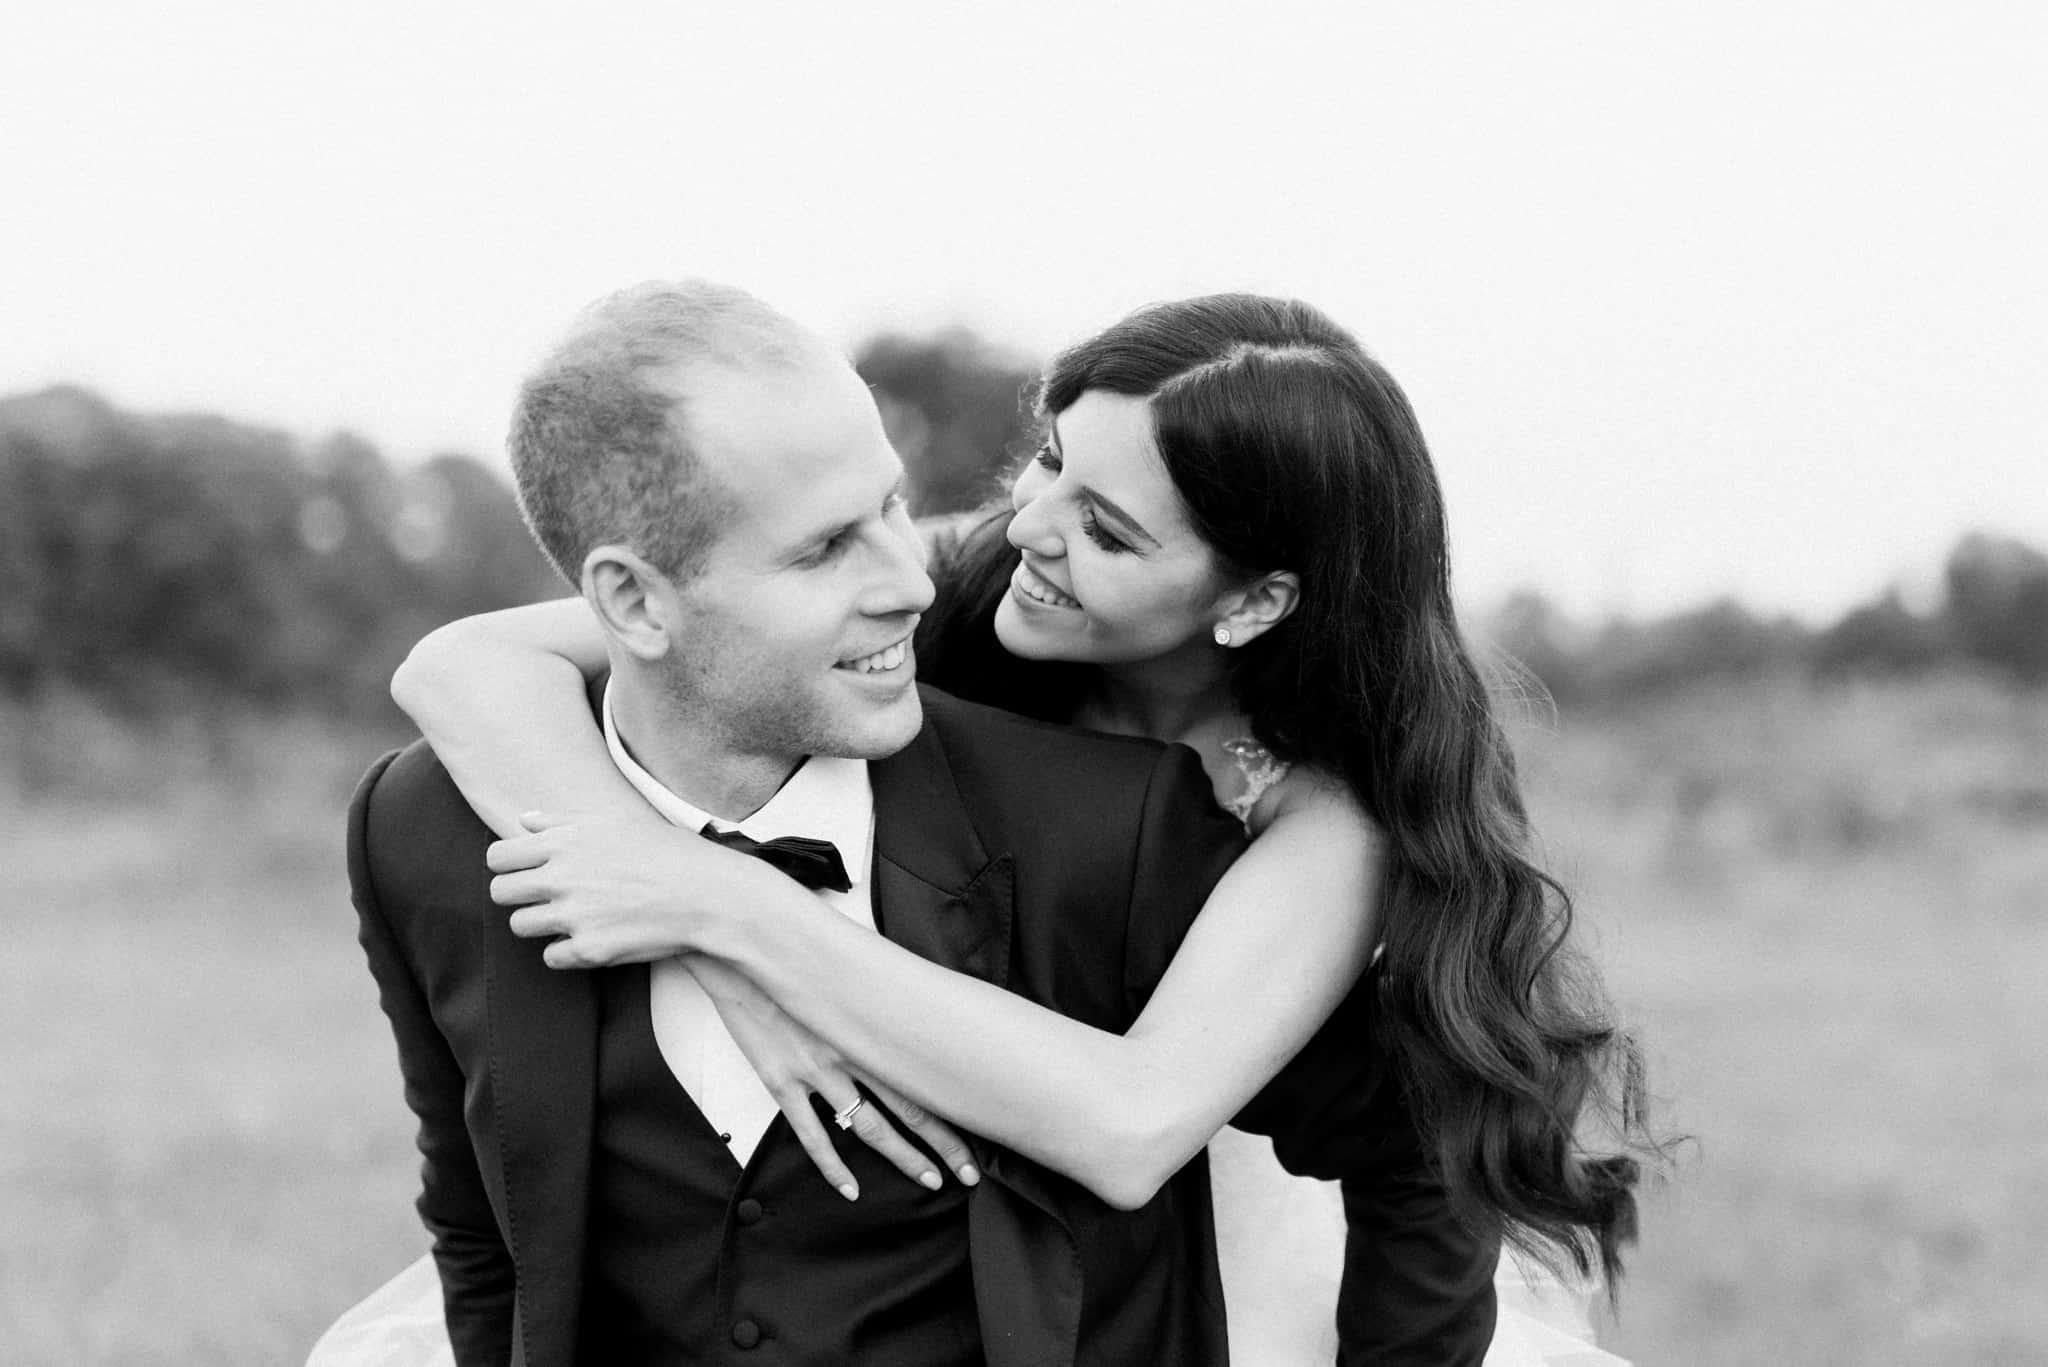 Wedoverhills_Prewedding_Film_Photographer_Happy_Bride_0045